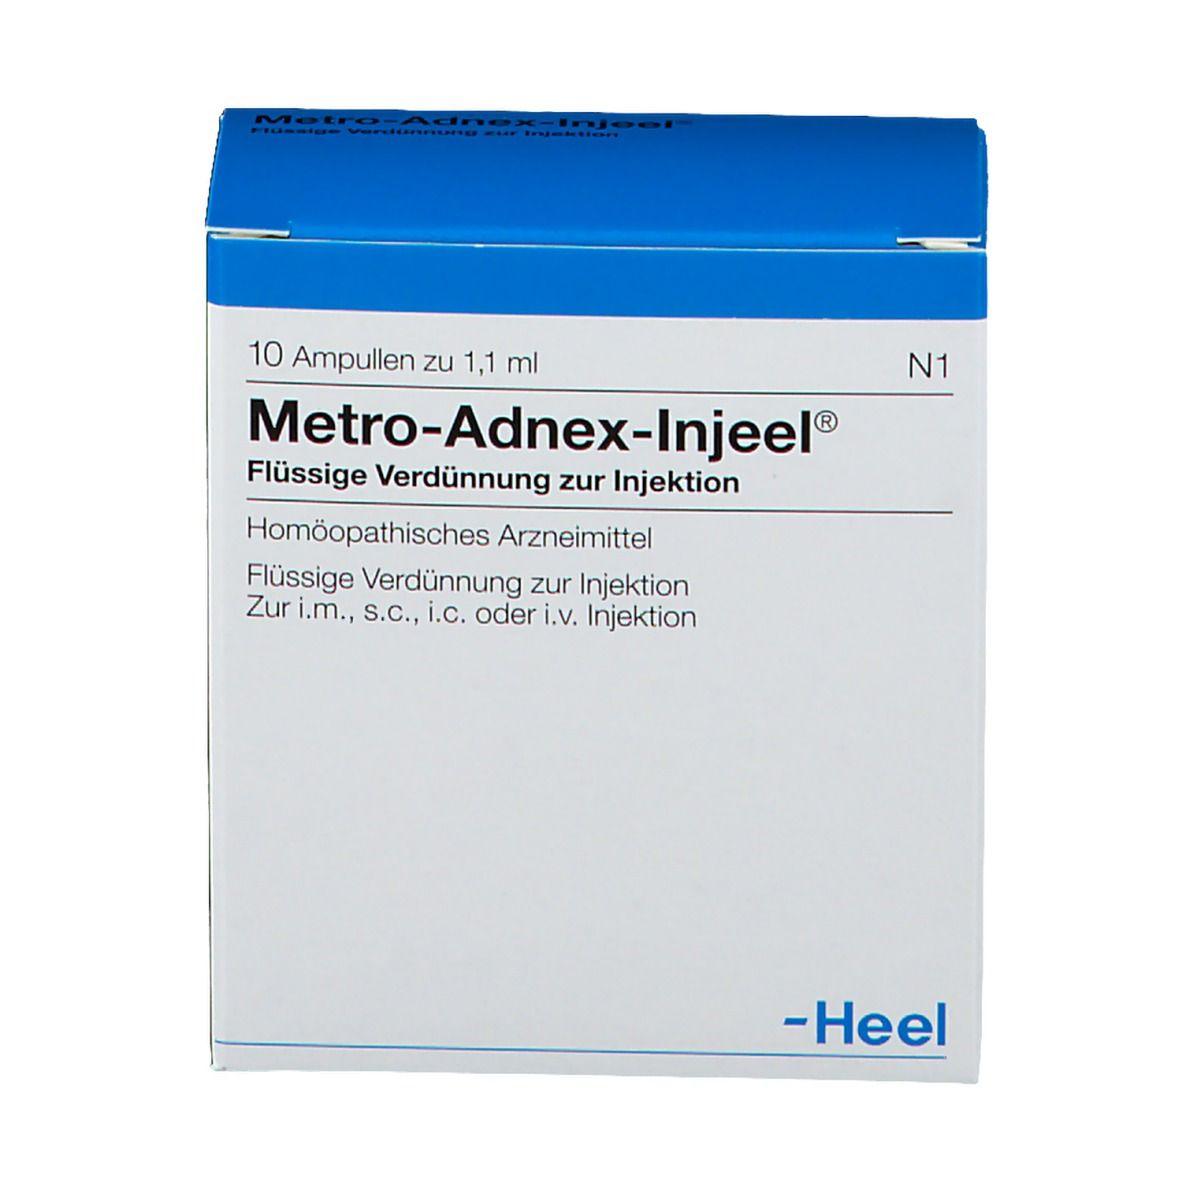 Adnex